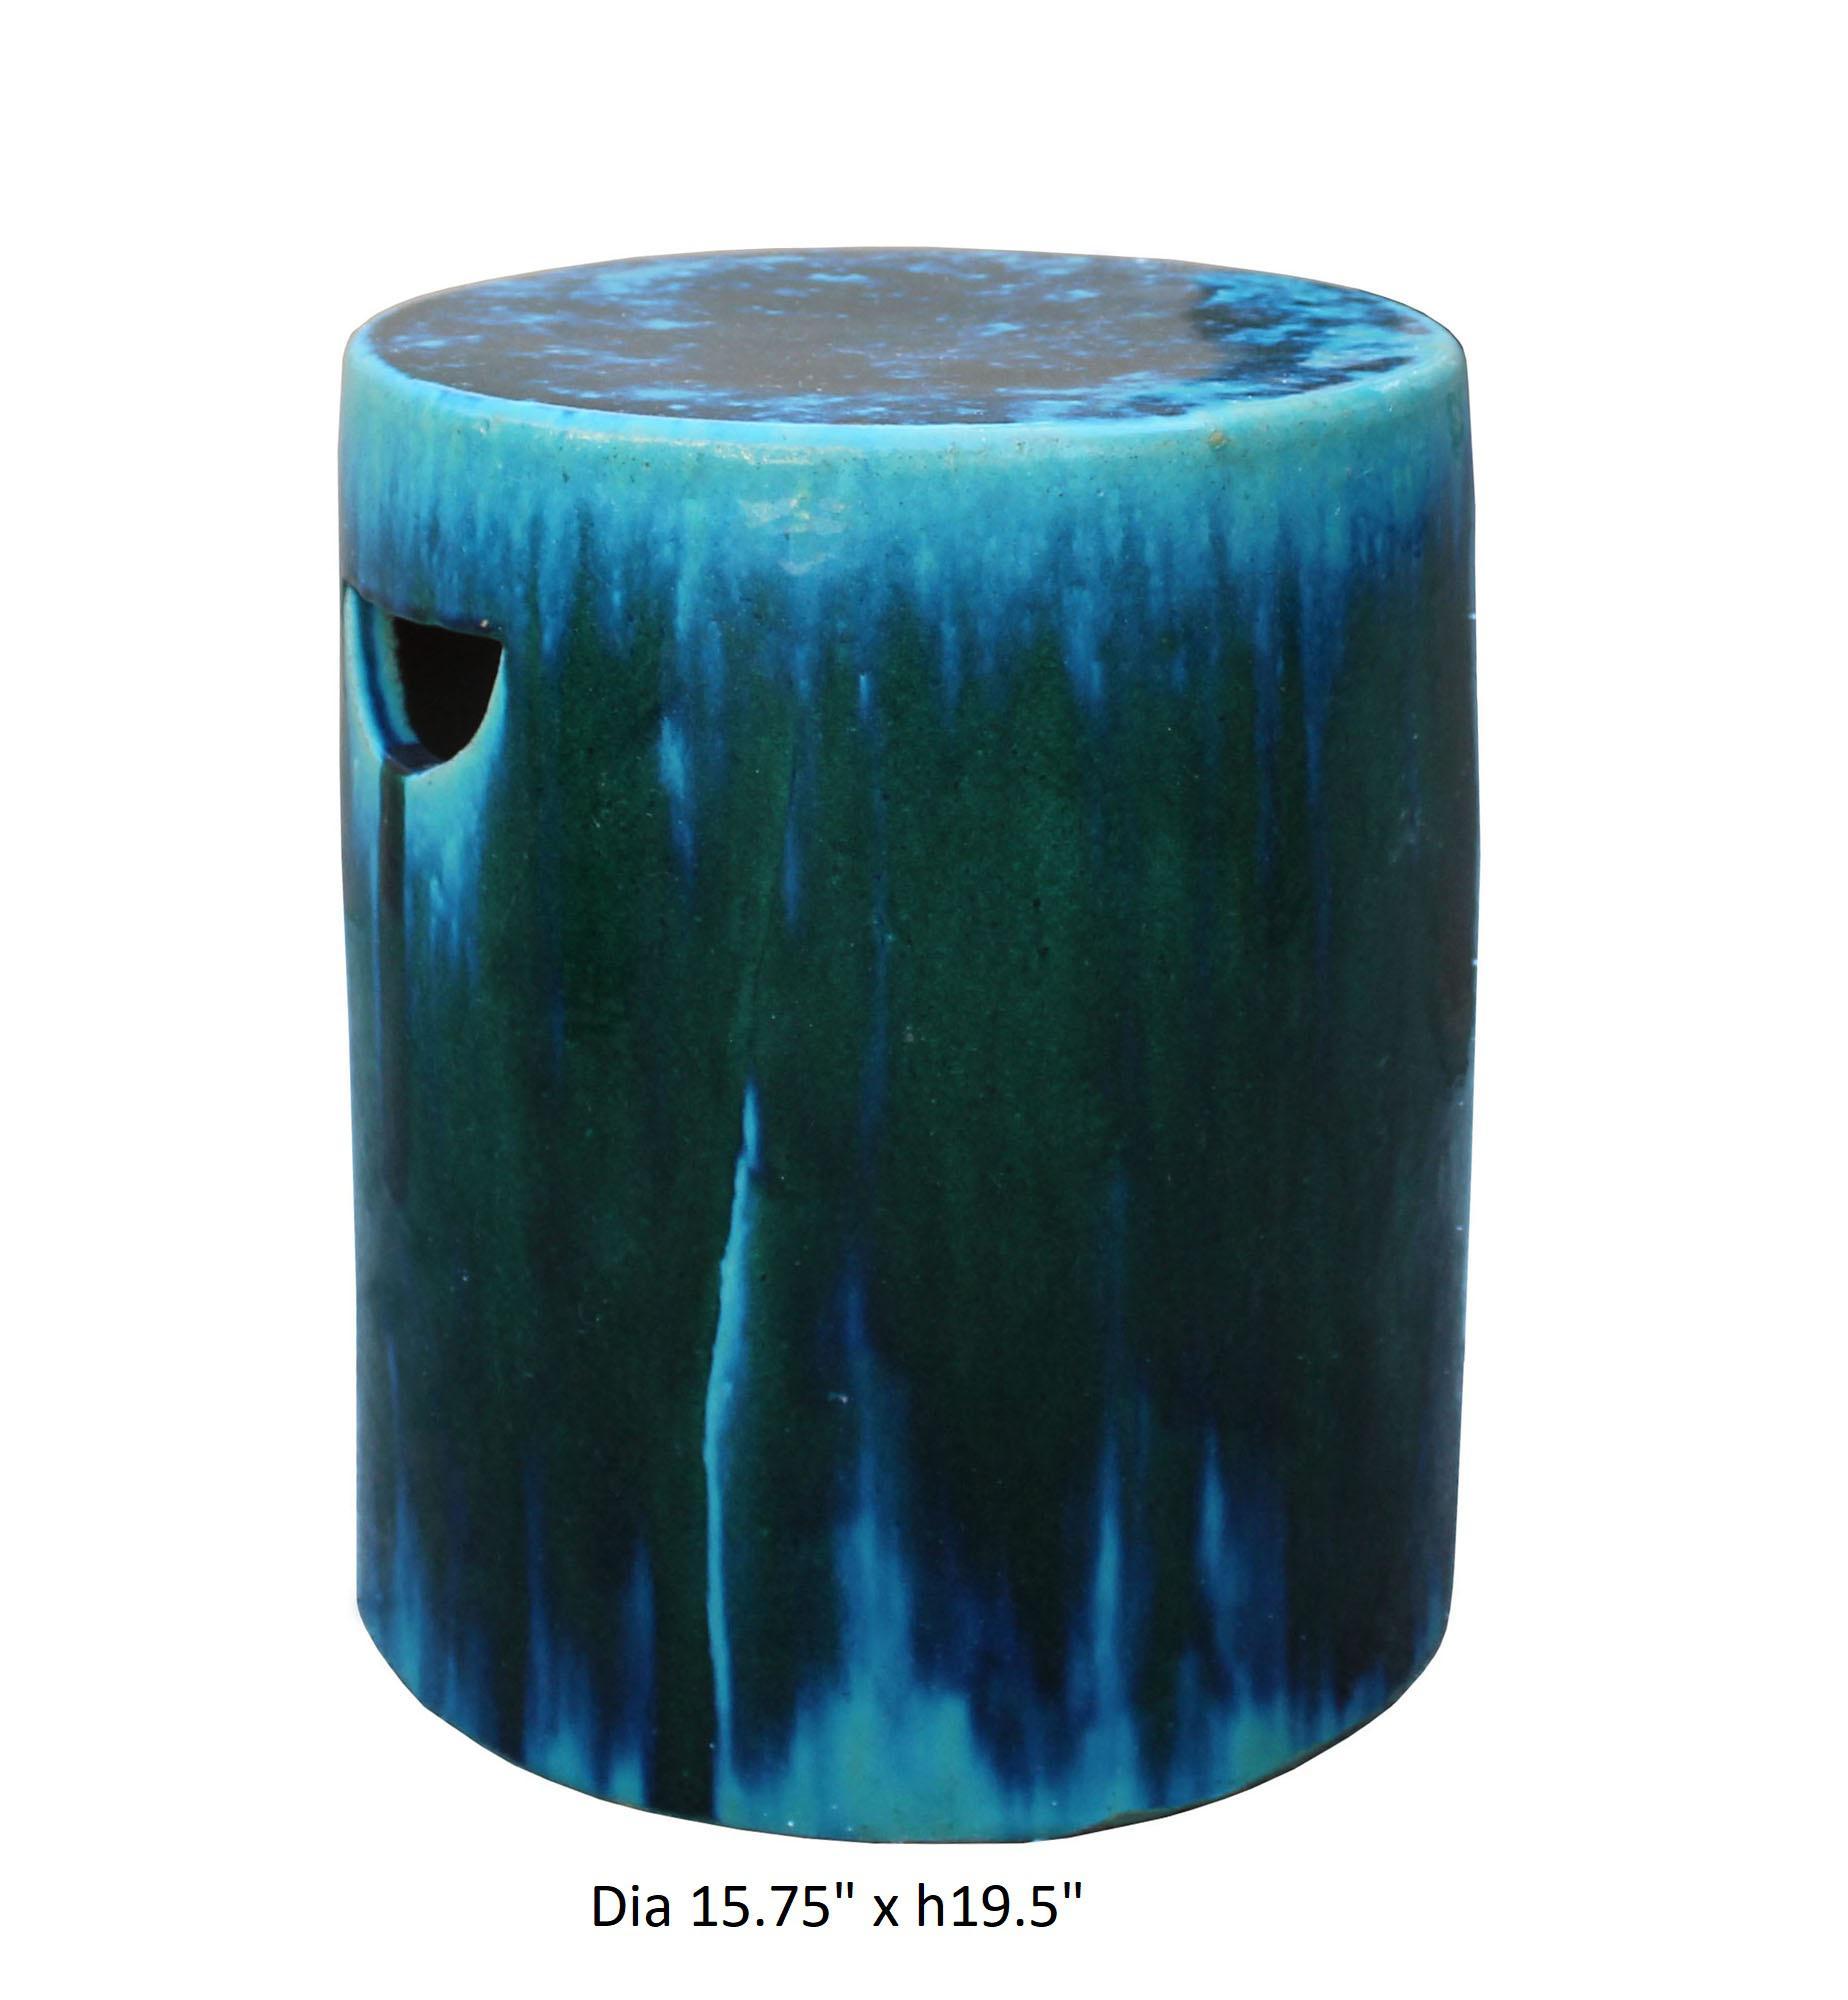 Chinese Ceramic Clay Green Turquoise Glaze Round Flat Column Garden Stool    Image 5 Of 5